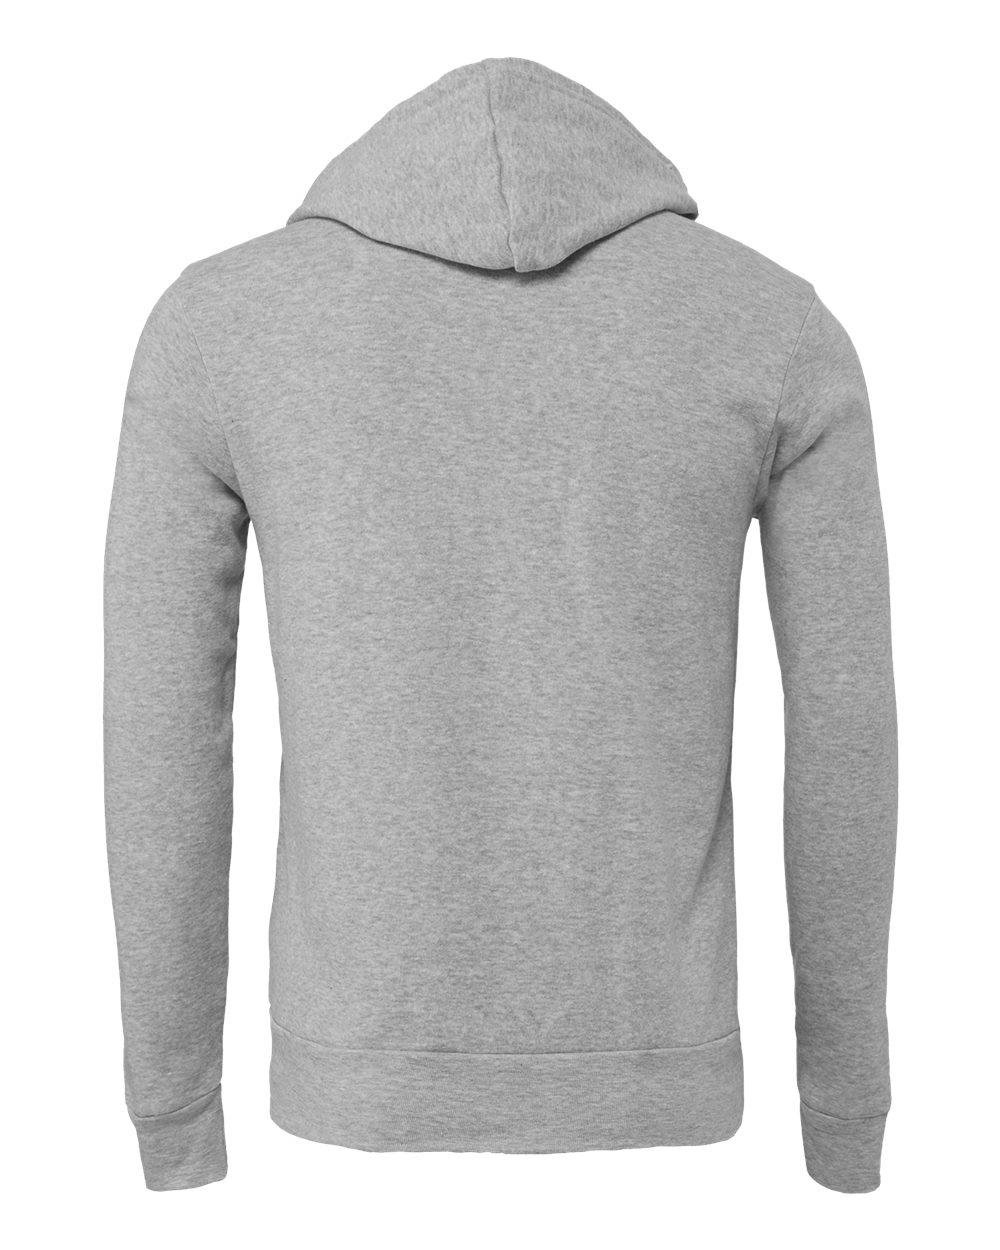 Bella-Canvas-Unisex-Sponge-Hooded-Pullover-Sweatshirt-Blank-3719-up-to-2XL thumbnail 9